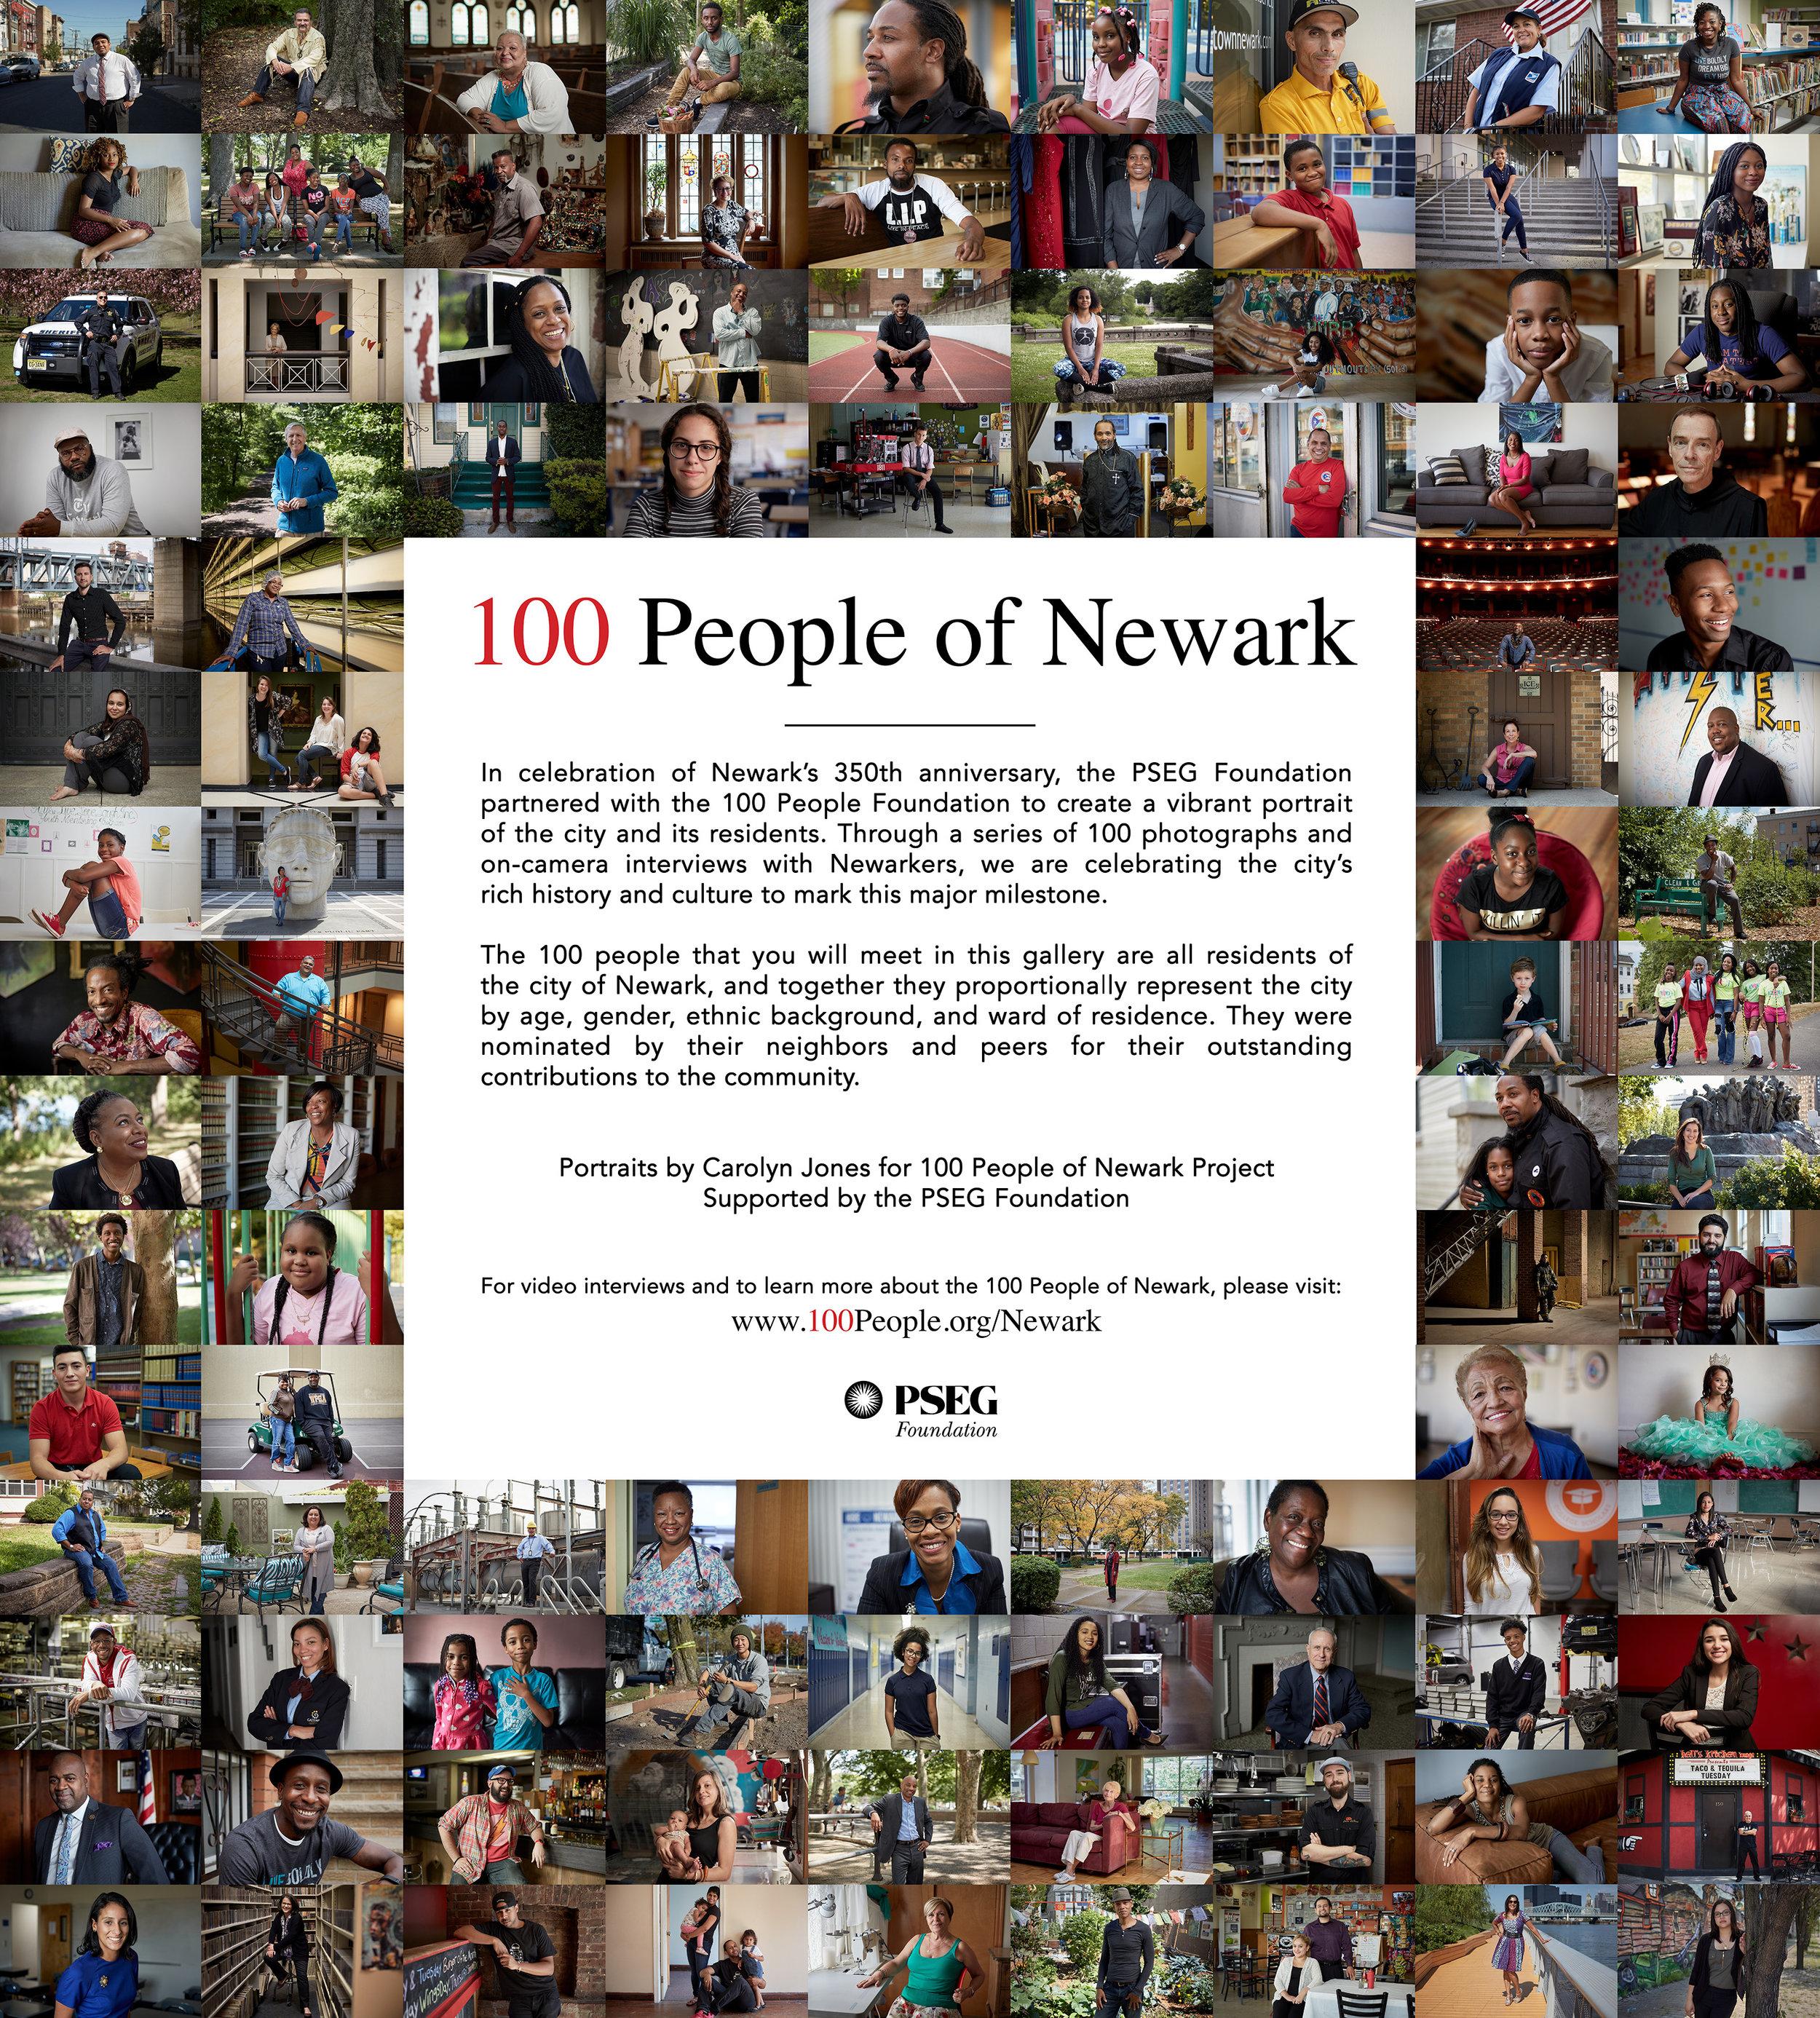 100 People of Newark